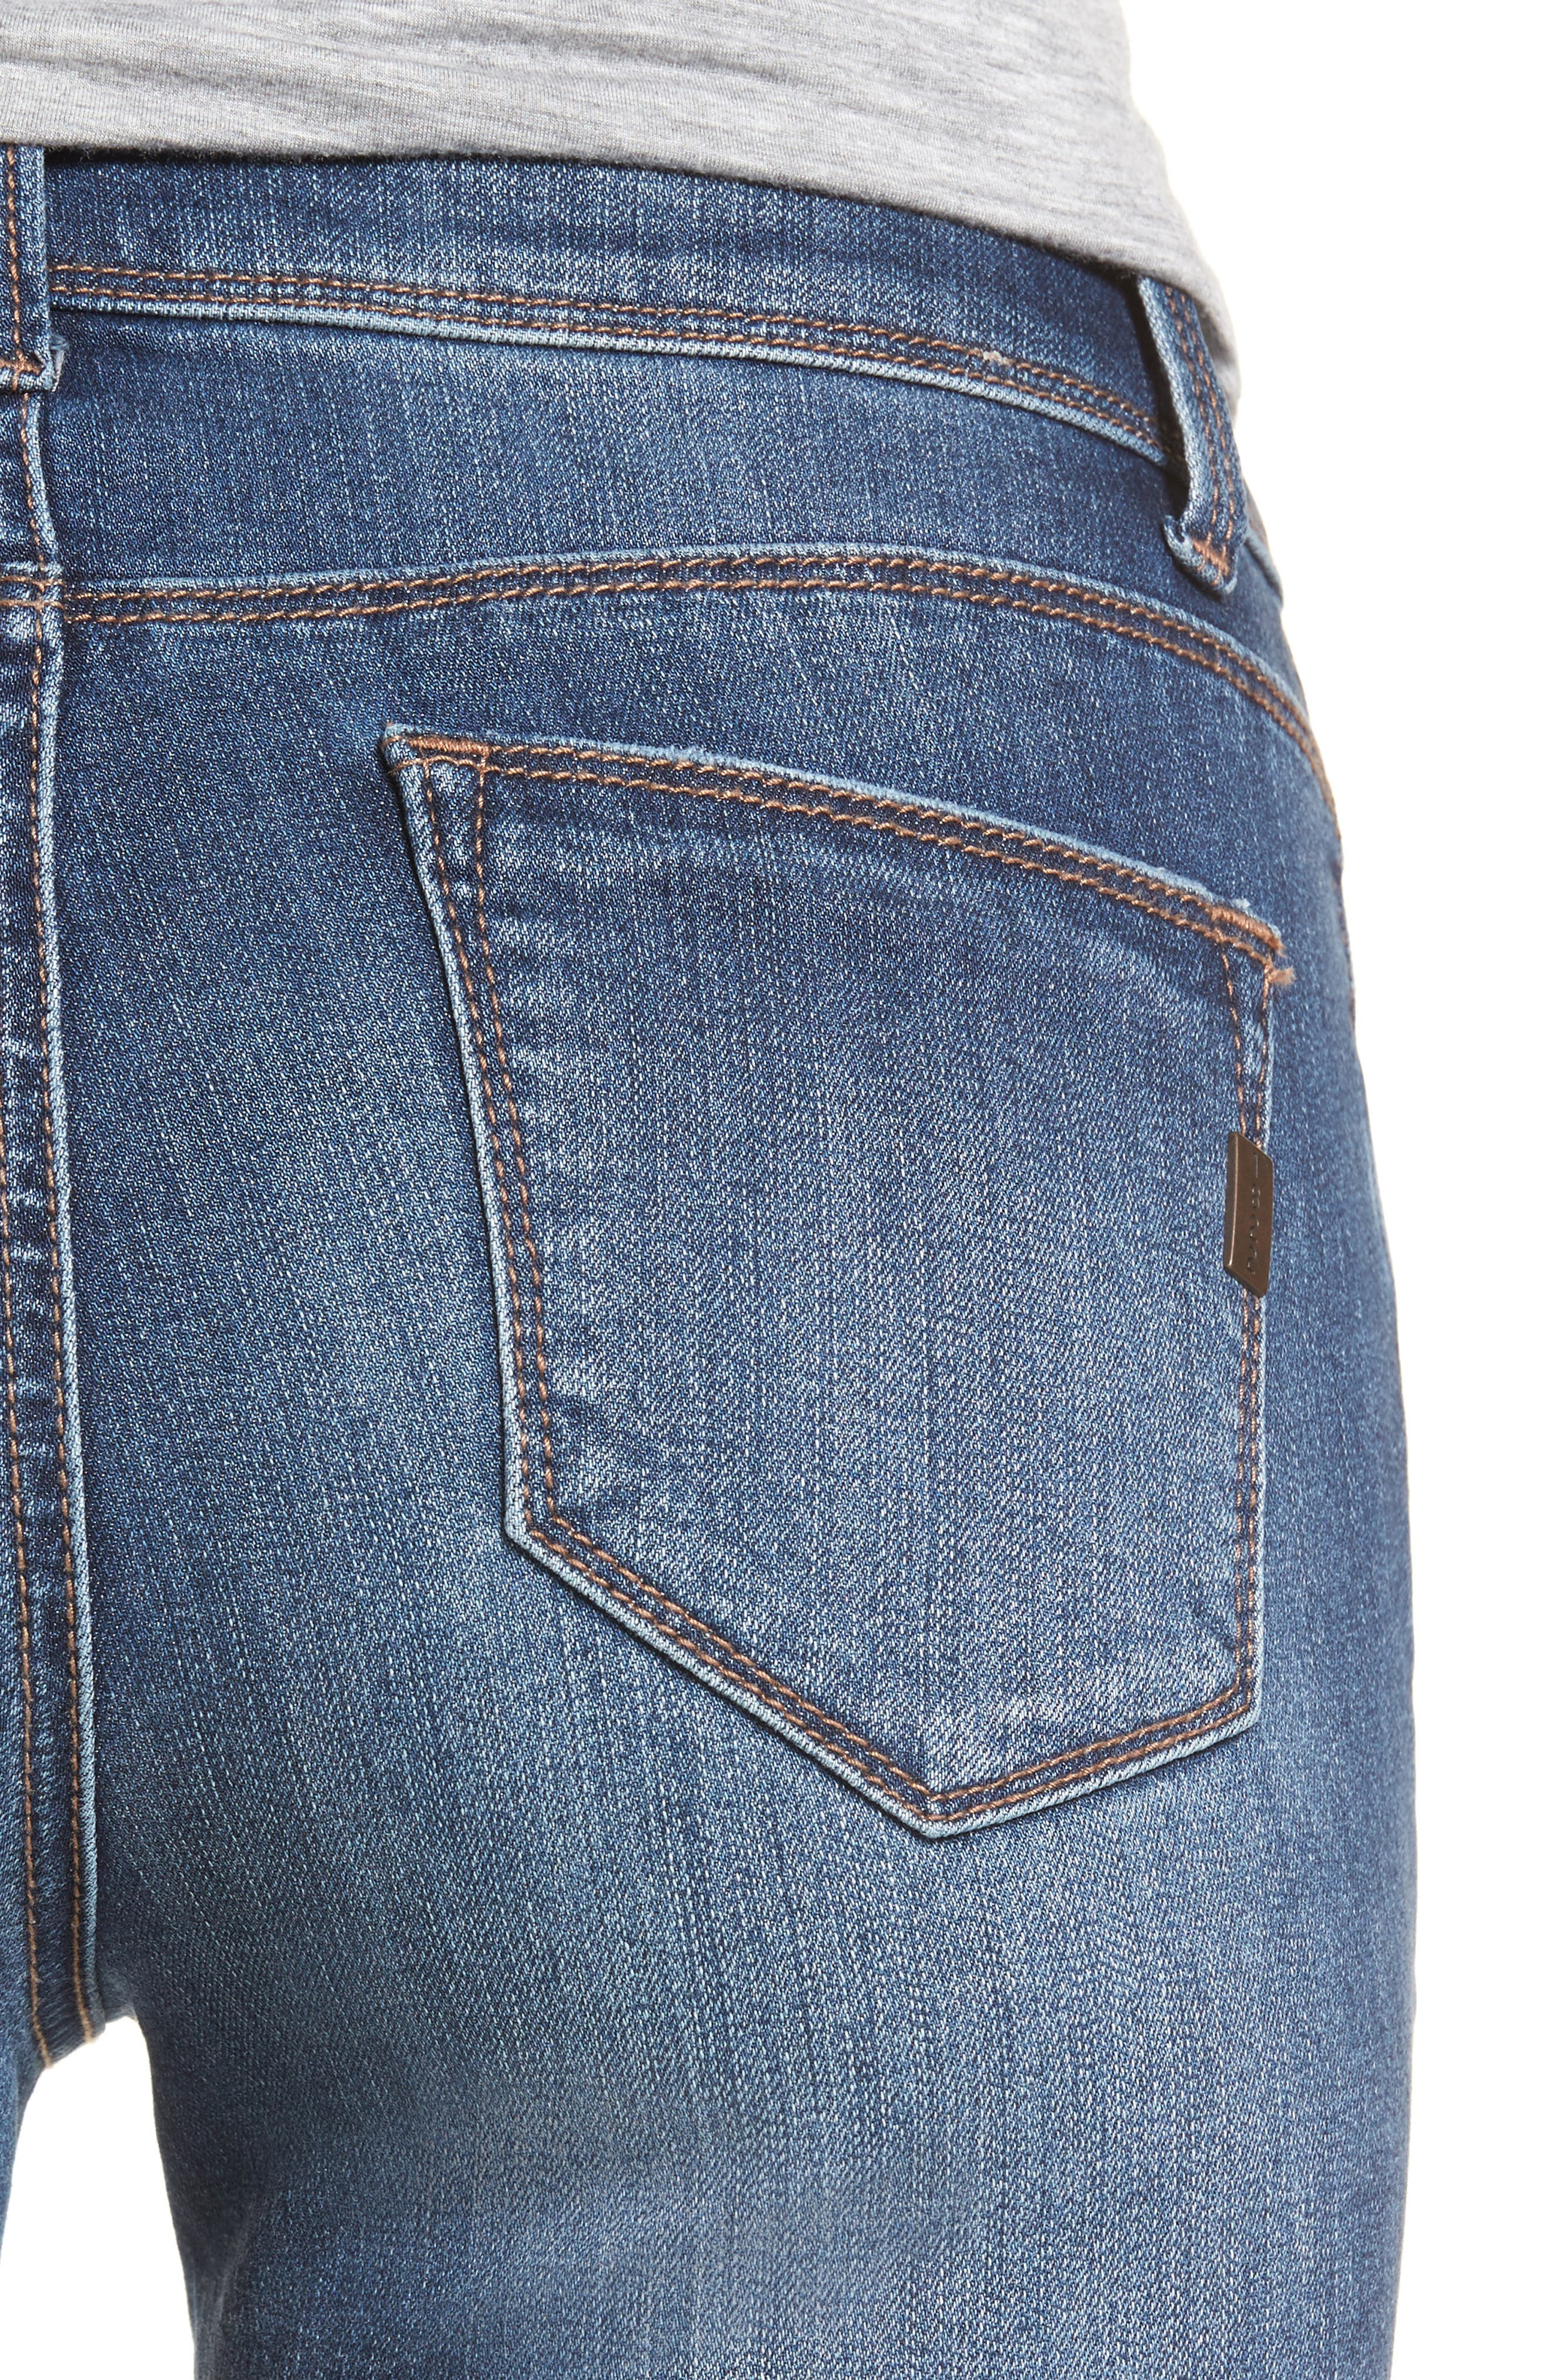 Double Fray Hem Skinny Jeans,                             Alternate thumbnail 4, color,                             420